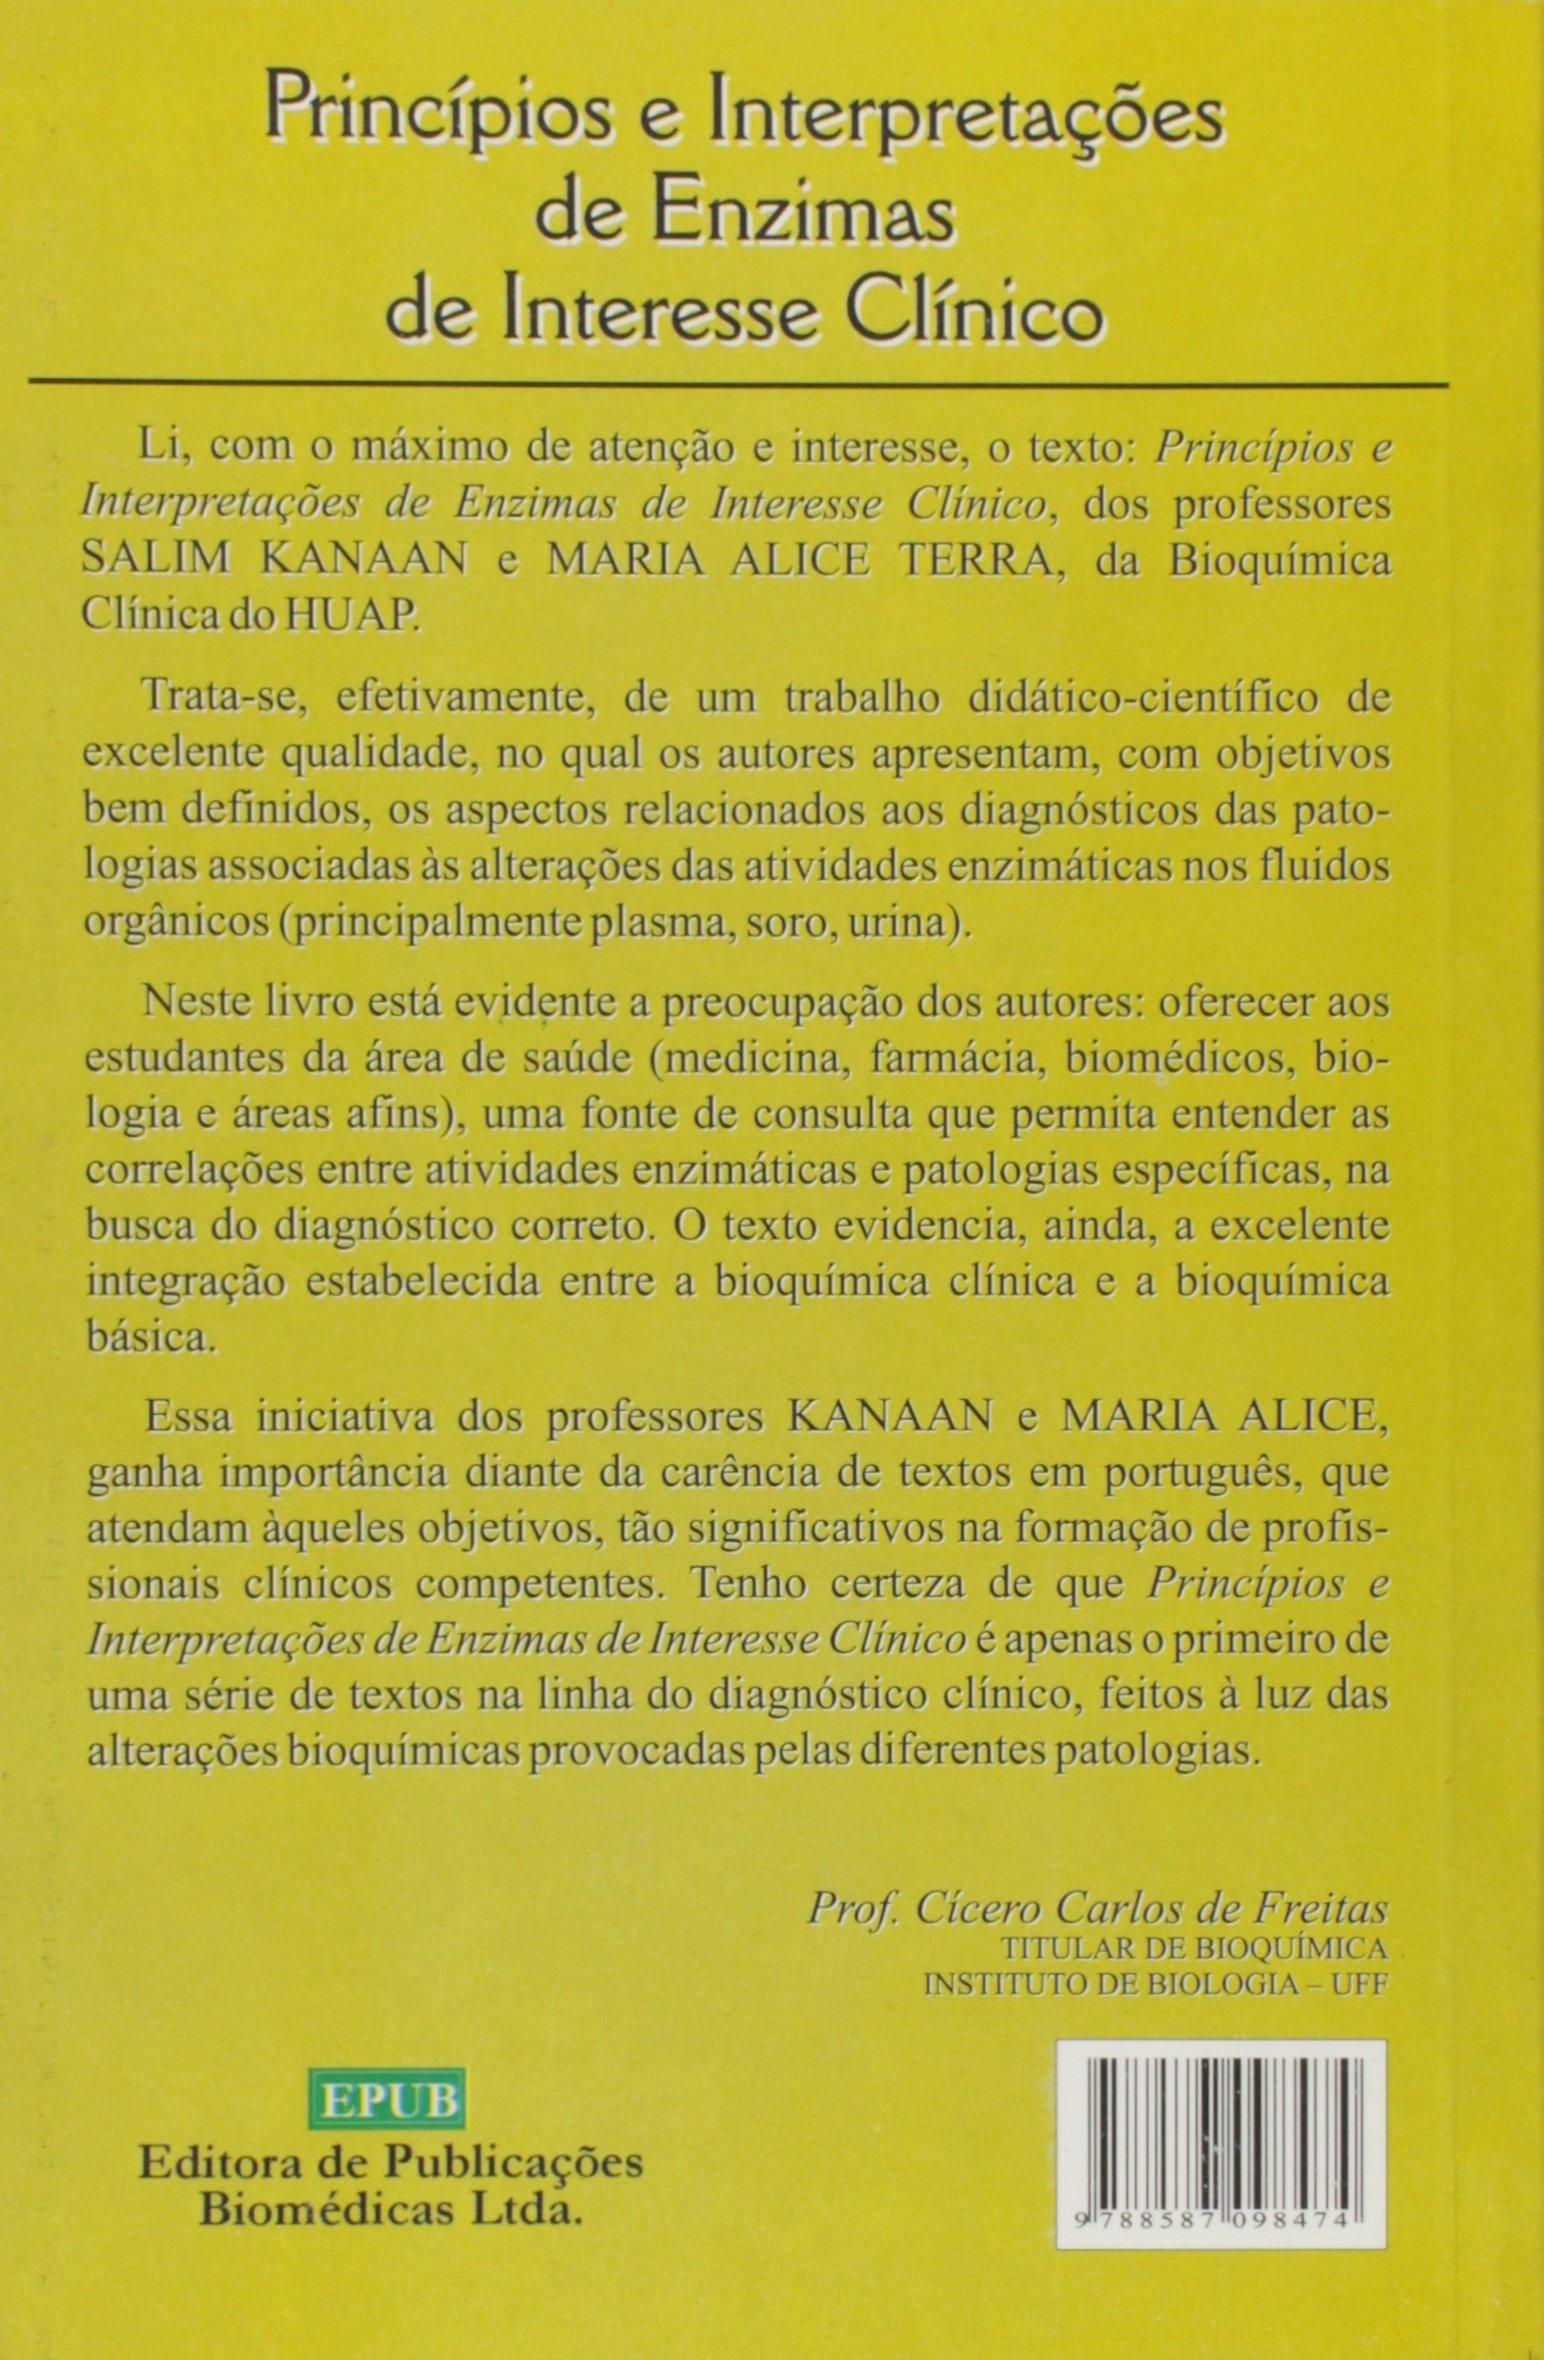 Principios E Interpretacoes De Enzimas E Interesse Clinico ...